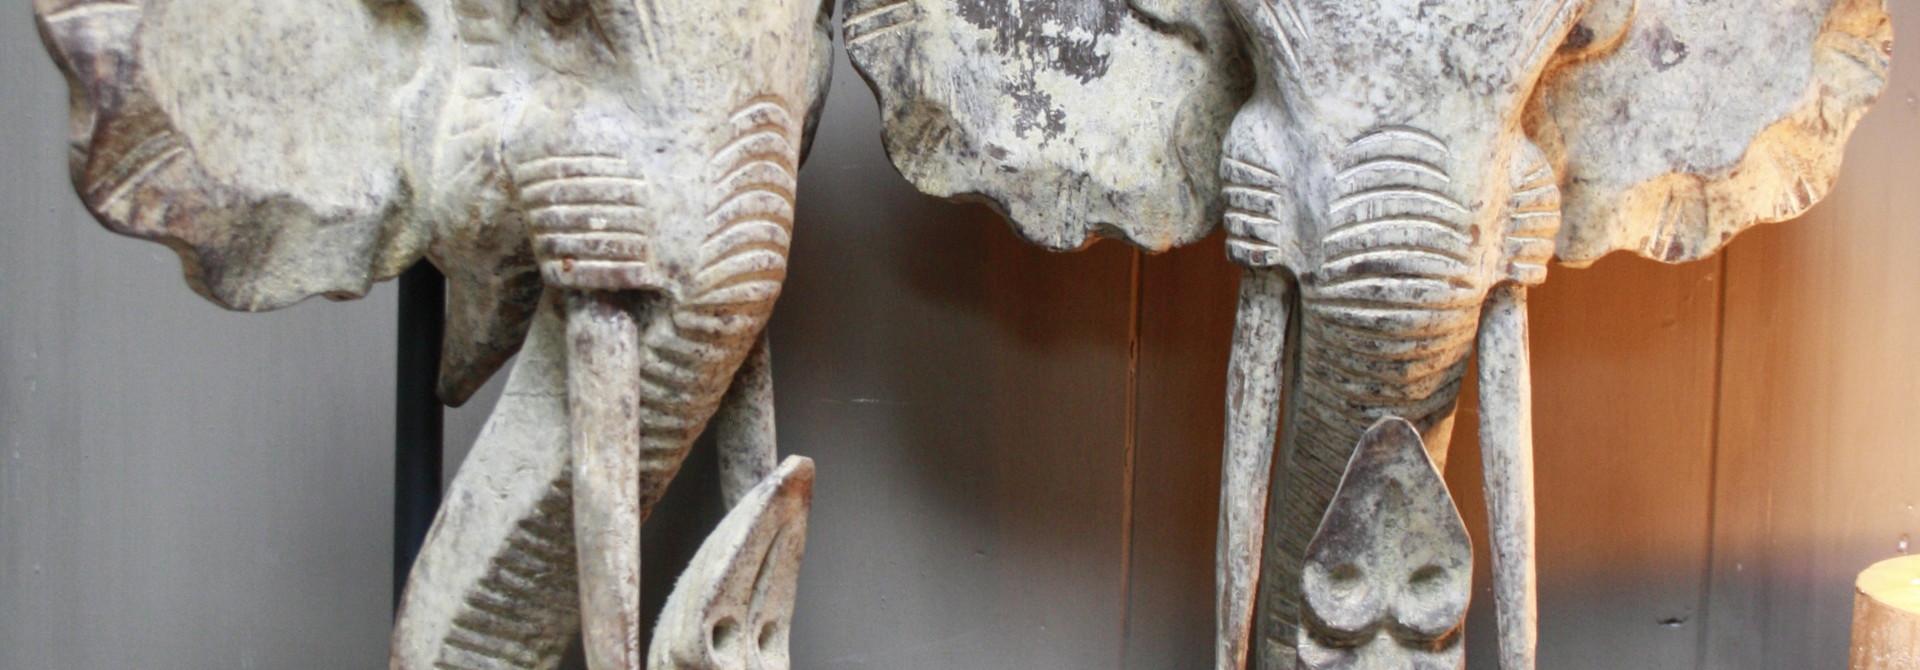 Houten olifant op voet 48 x 40 cm